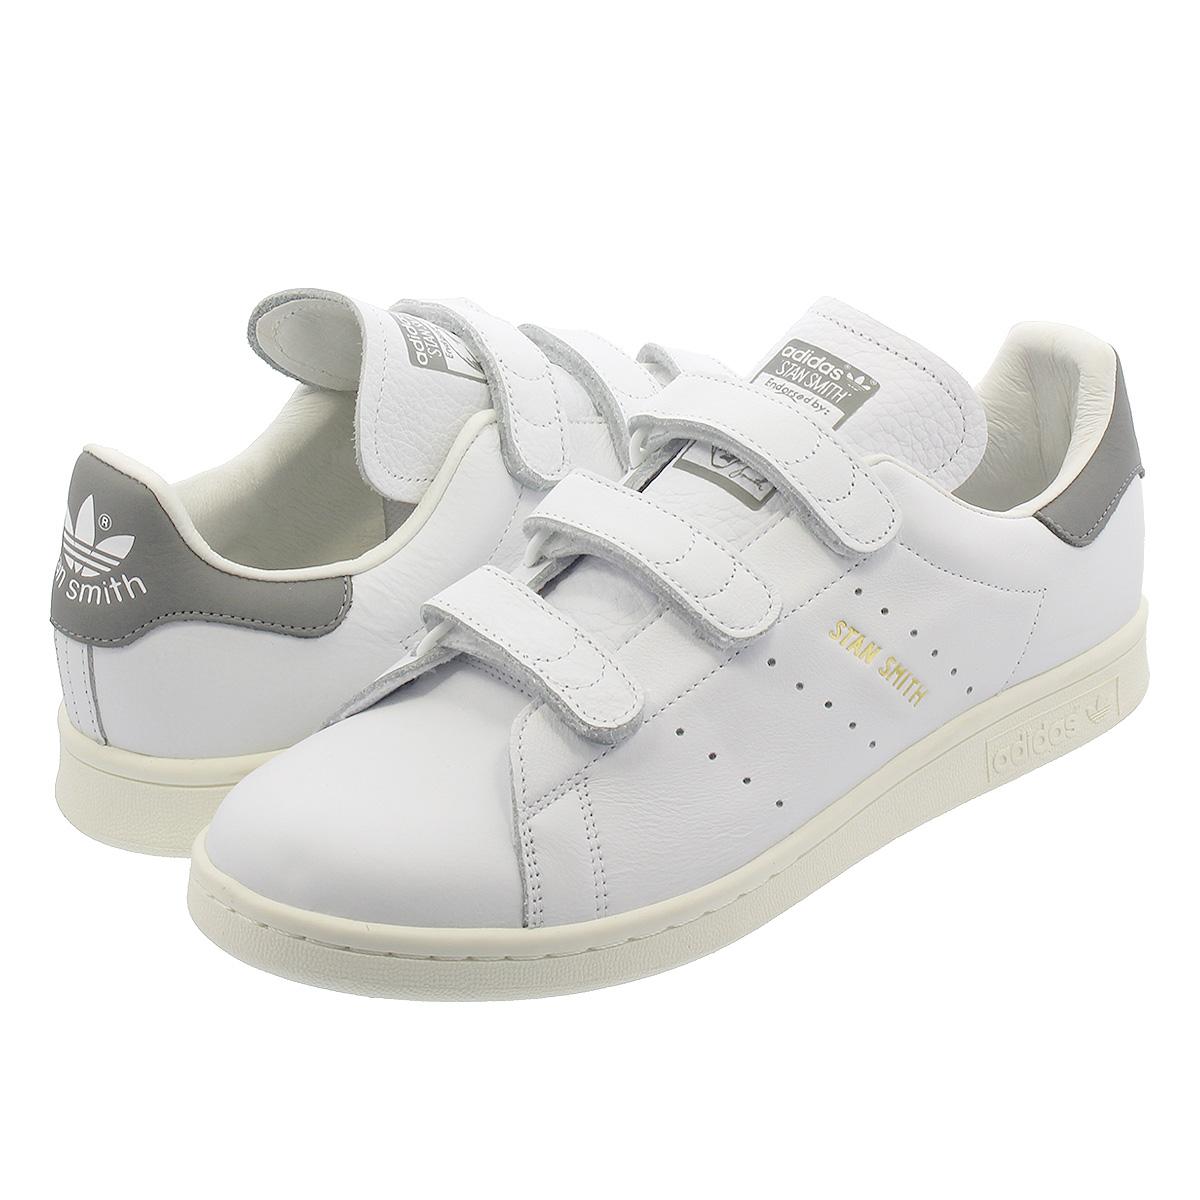 size 40 95d93 e68c8 adidas STAN SMITH CF Adidas Stan Smith CF RUNNING WHITE/RUNNING WHITE/GREY  ee8542